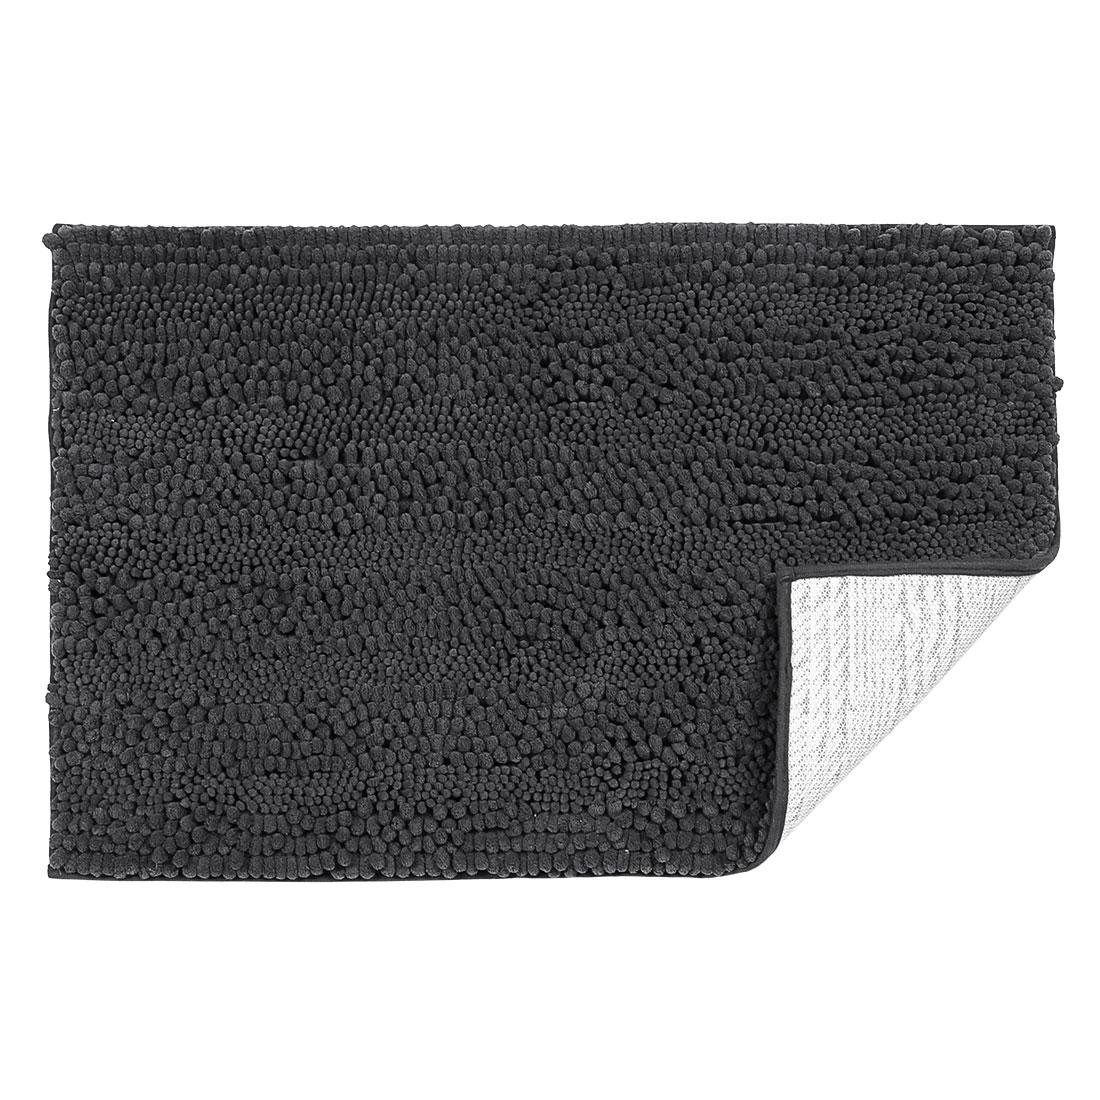 20 x 32 Inch Luxury Soft Plush Shaggy Bath Mat Chenille Rug Carpet Dark Gray